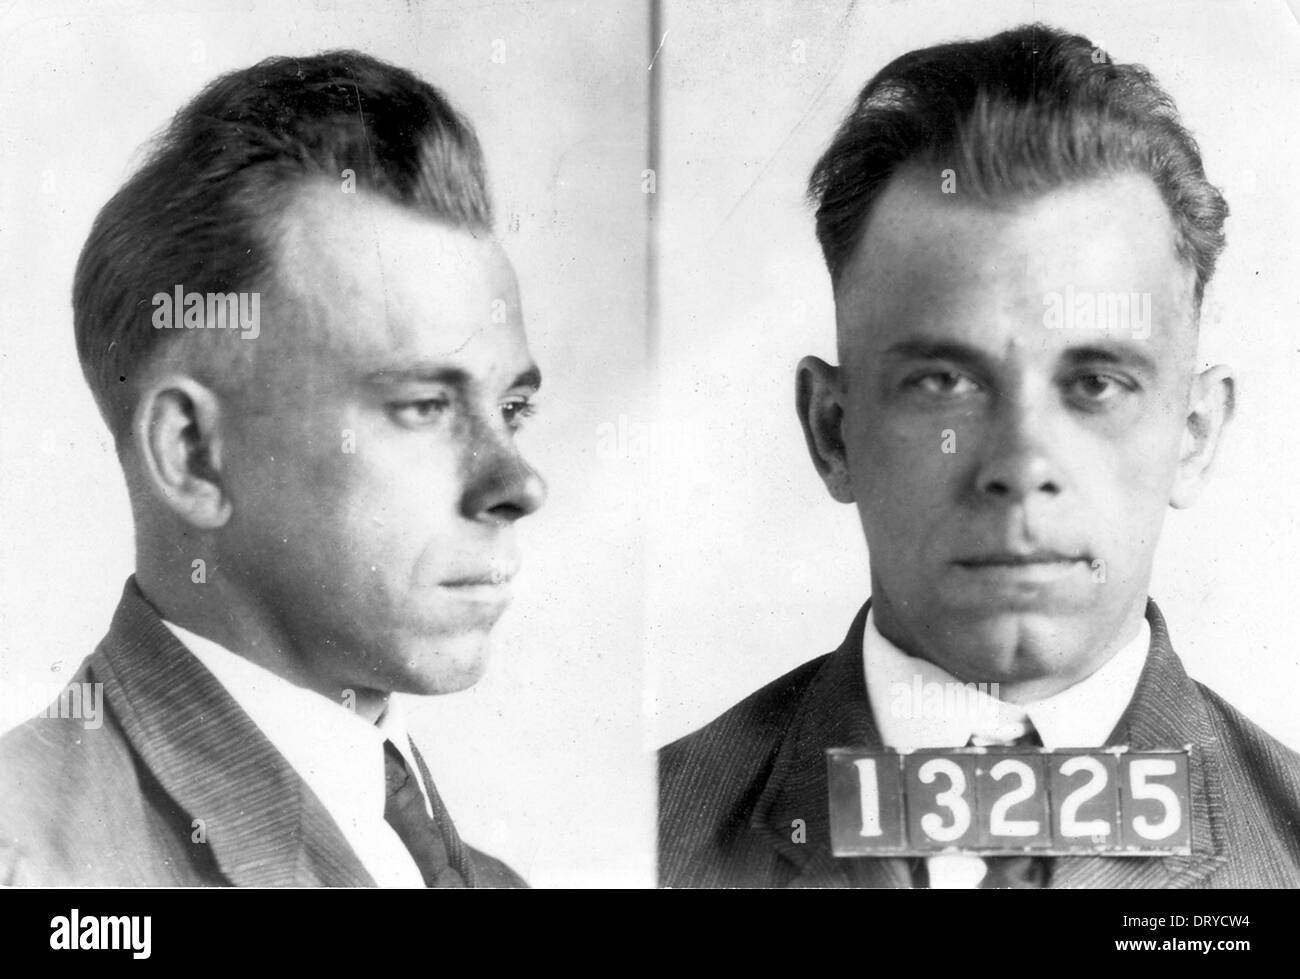 John Dillinger, John Herbert Dillinger, American gangster and bank robber in the Depression-era United States - Stock Image